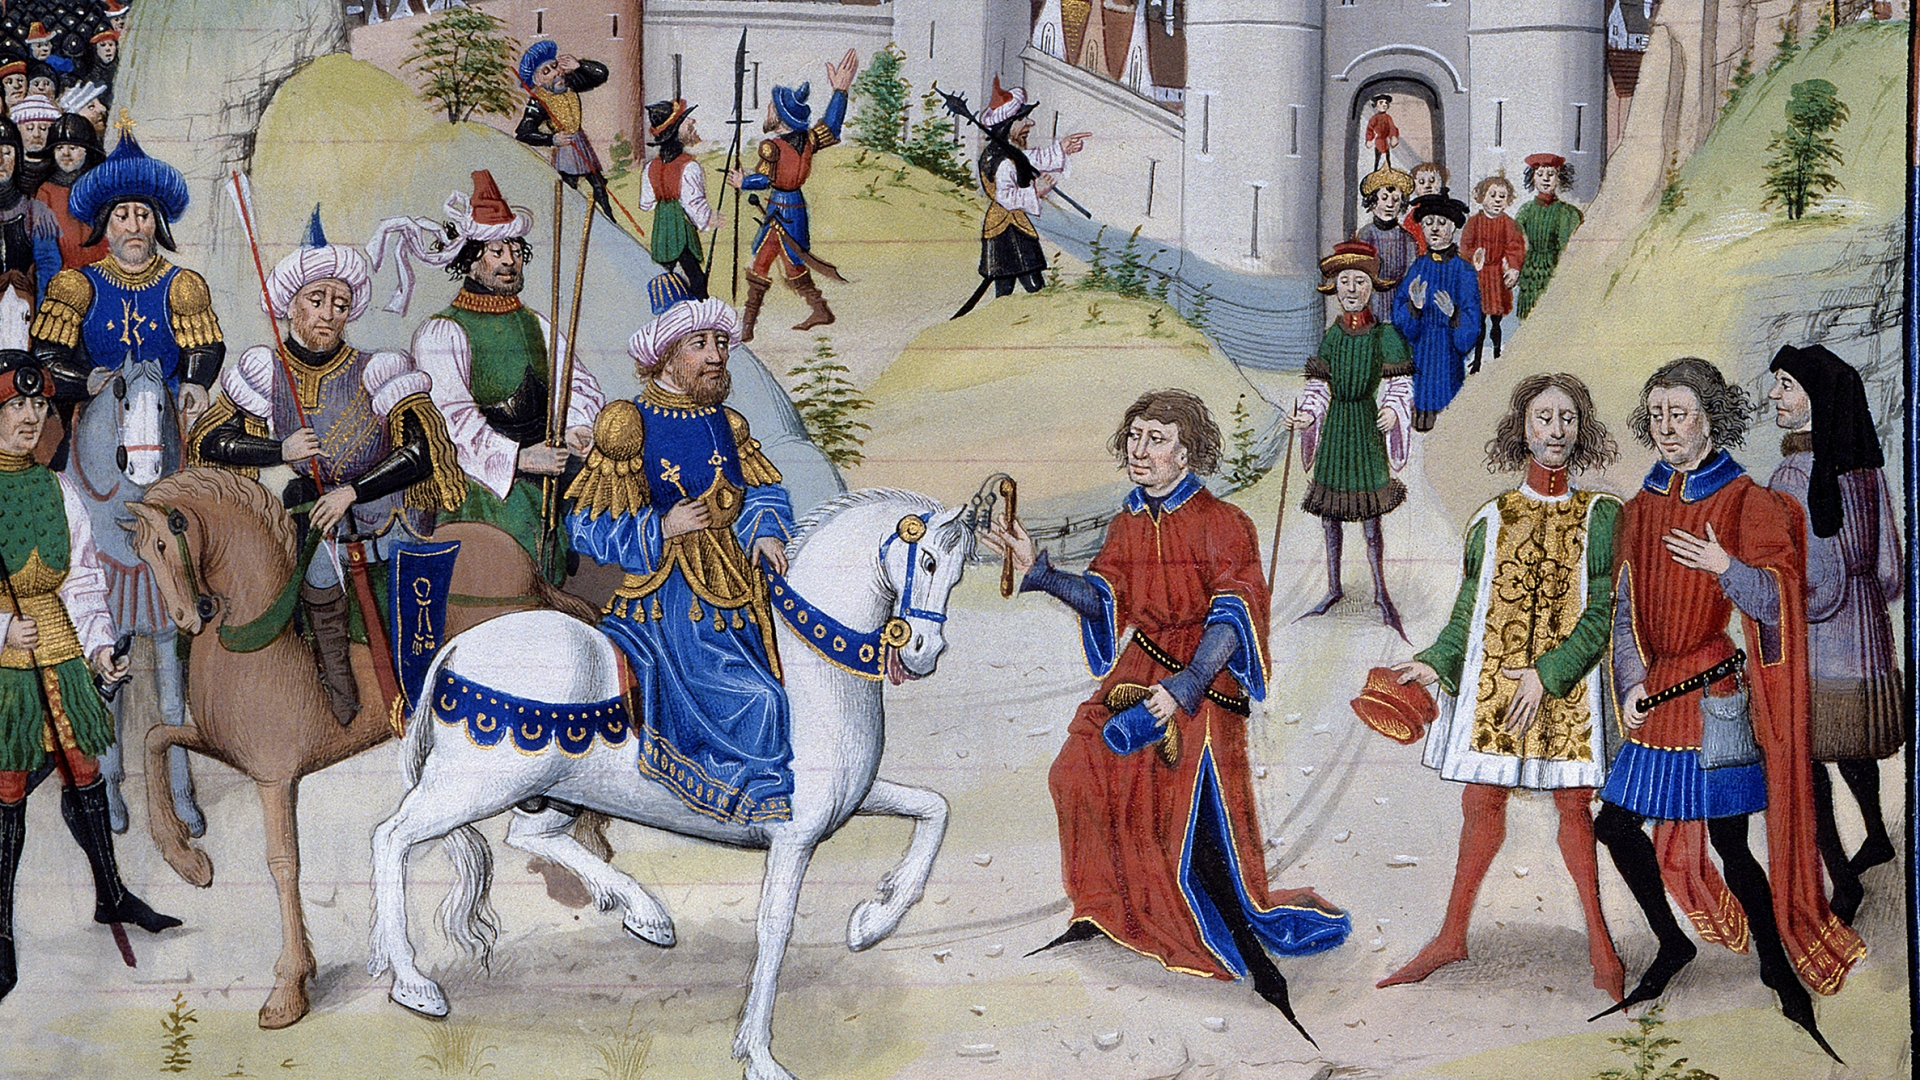 Saladin's forces recapture Jerusalem from the crusaders, 1187. (Credit: Leemage/Corbis via Getty Images)